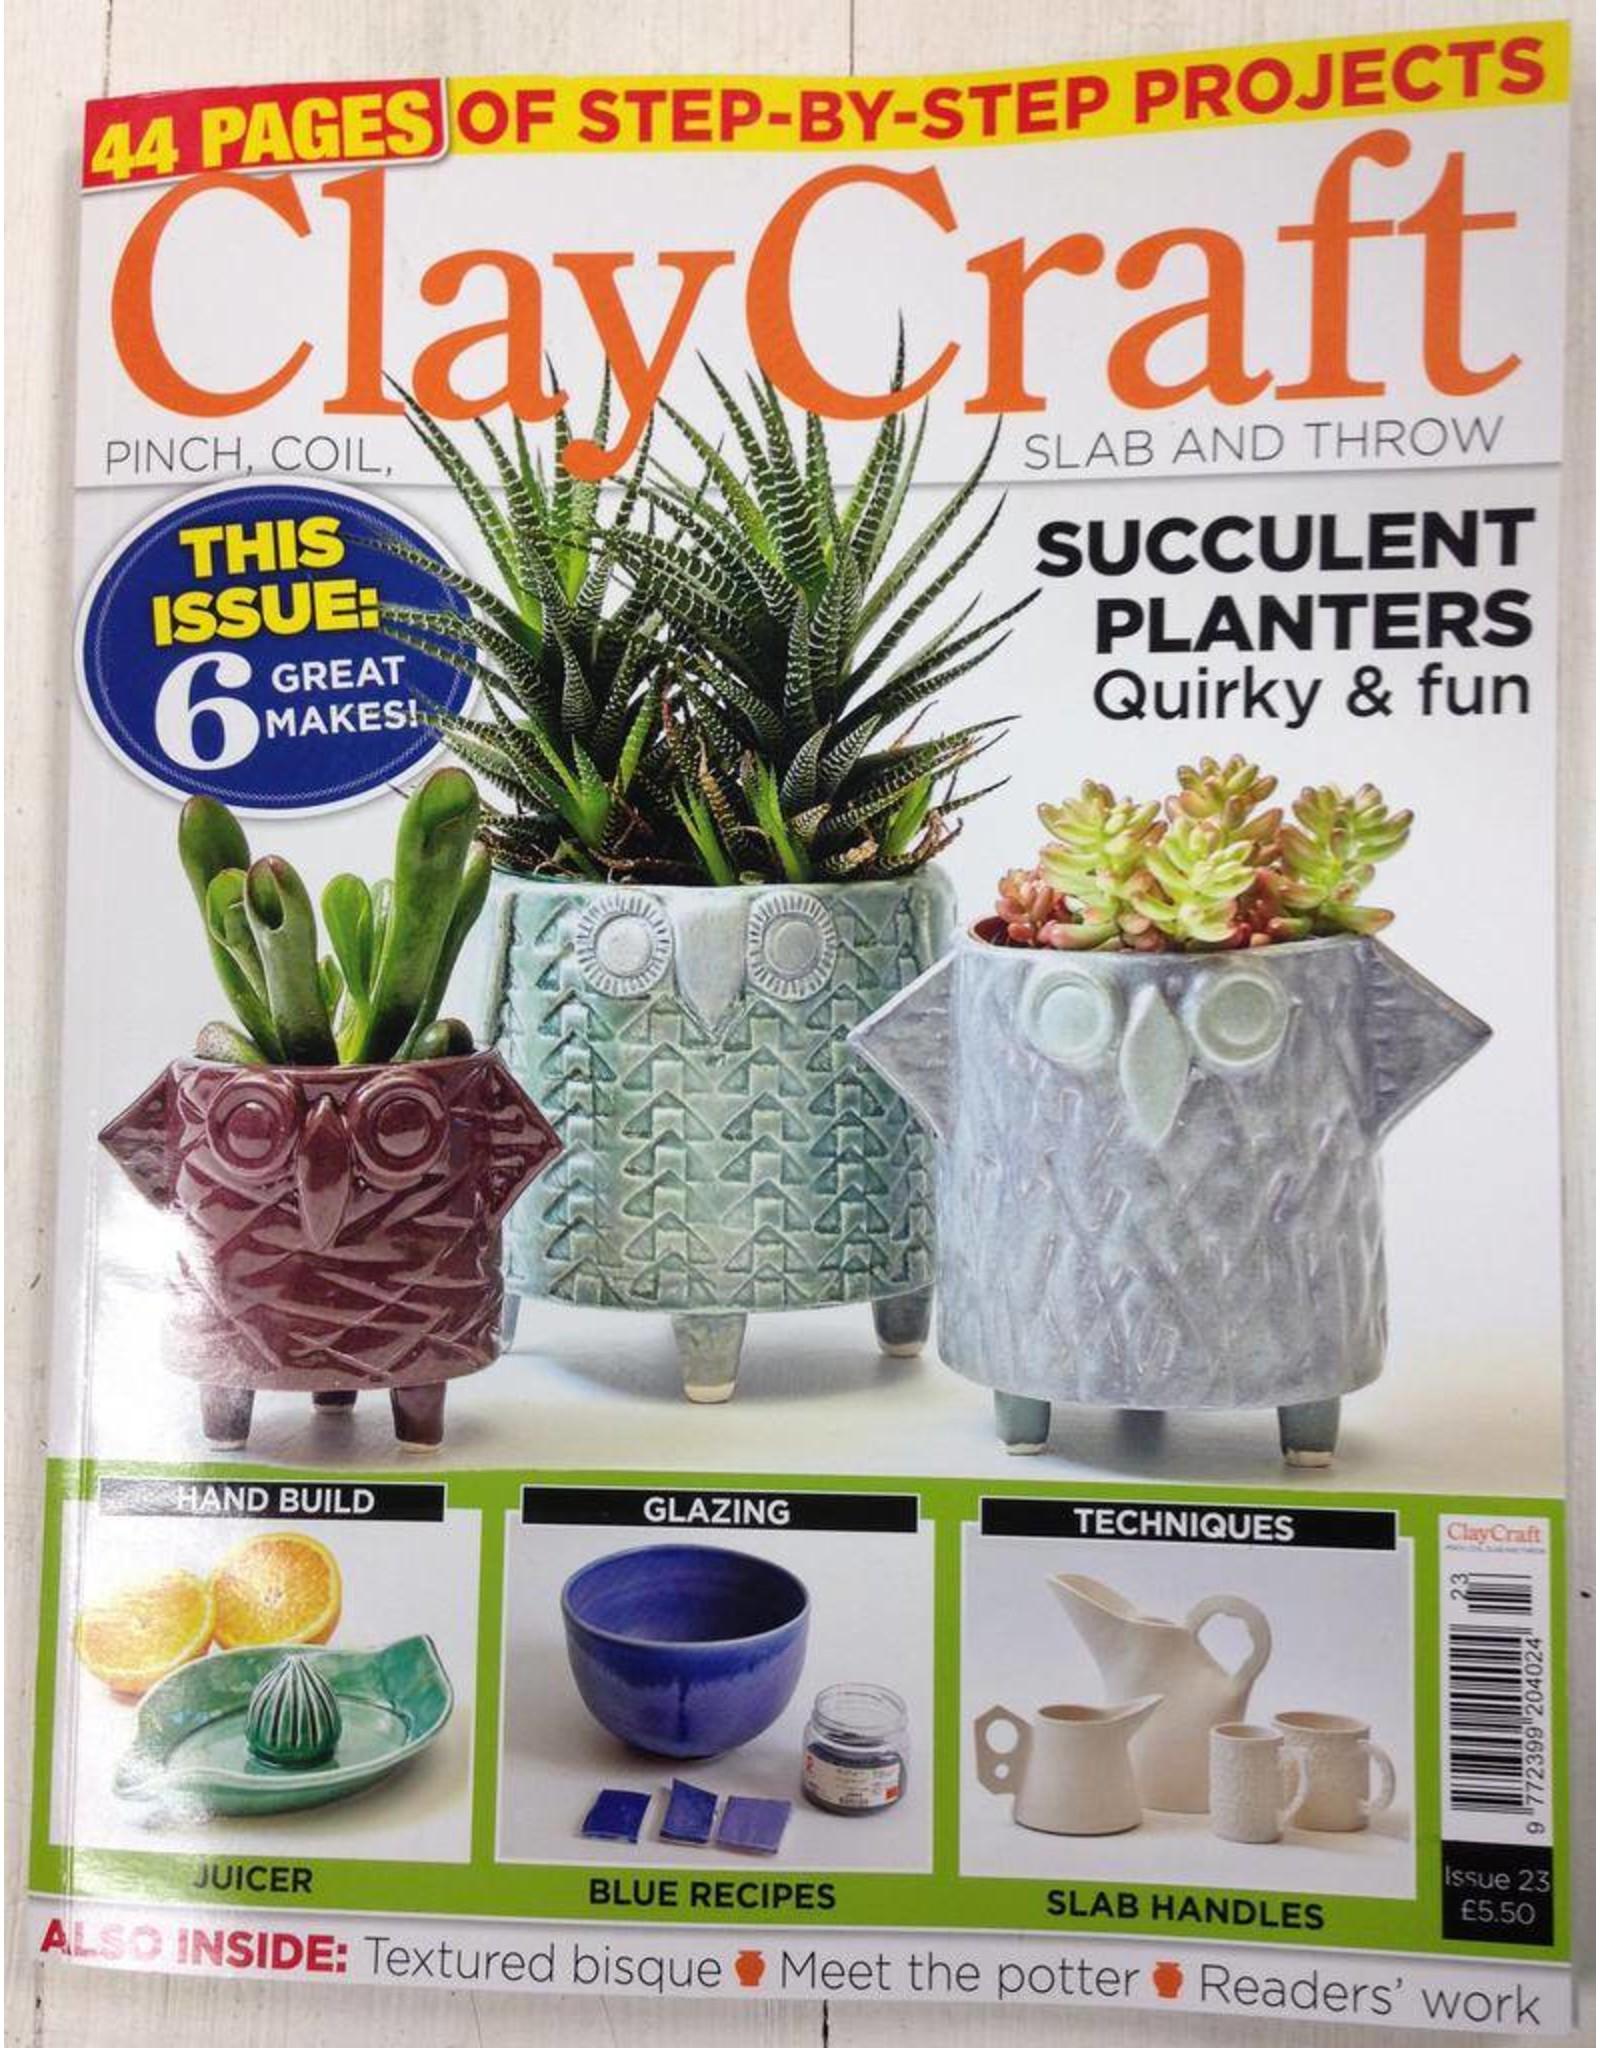 ClayCraft Magazine (latest issue)